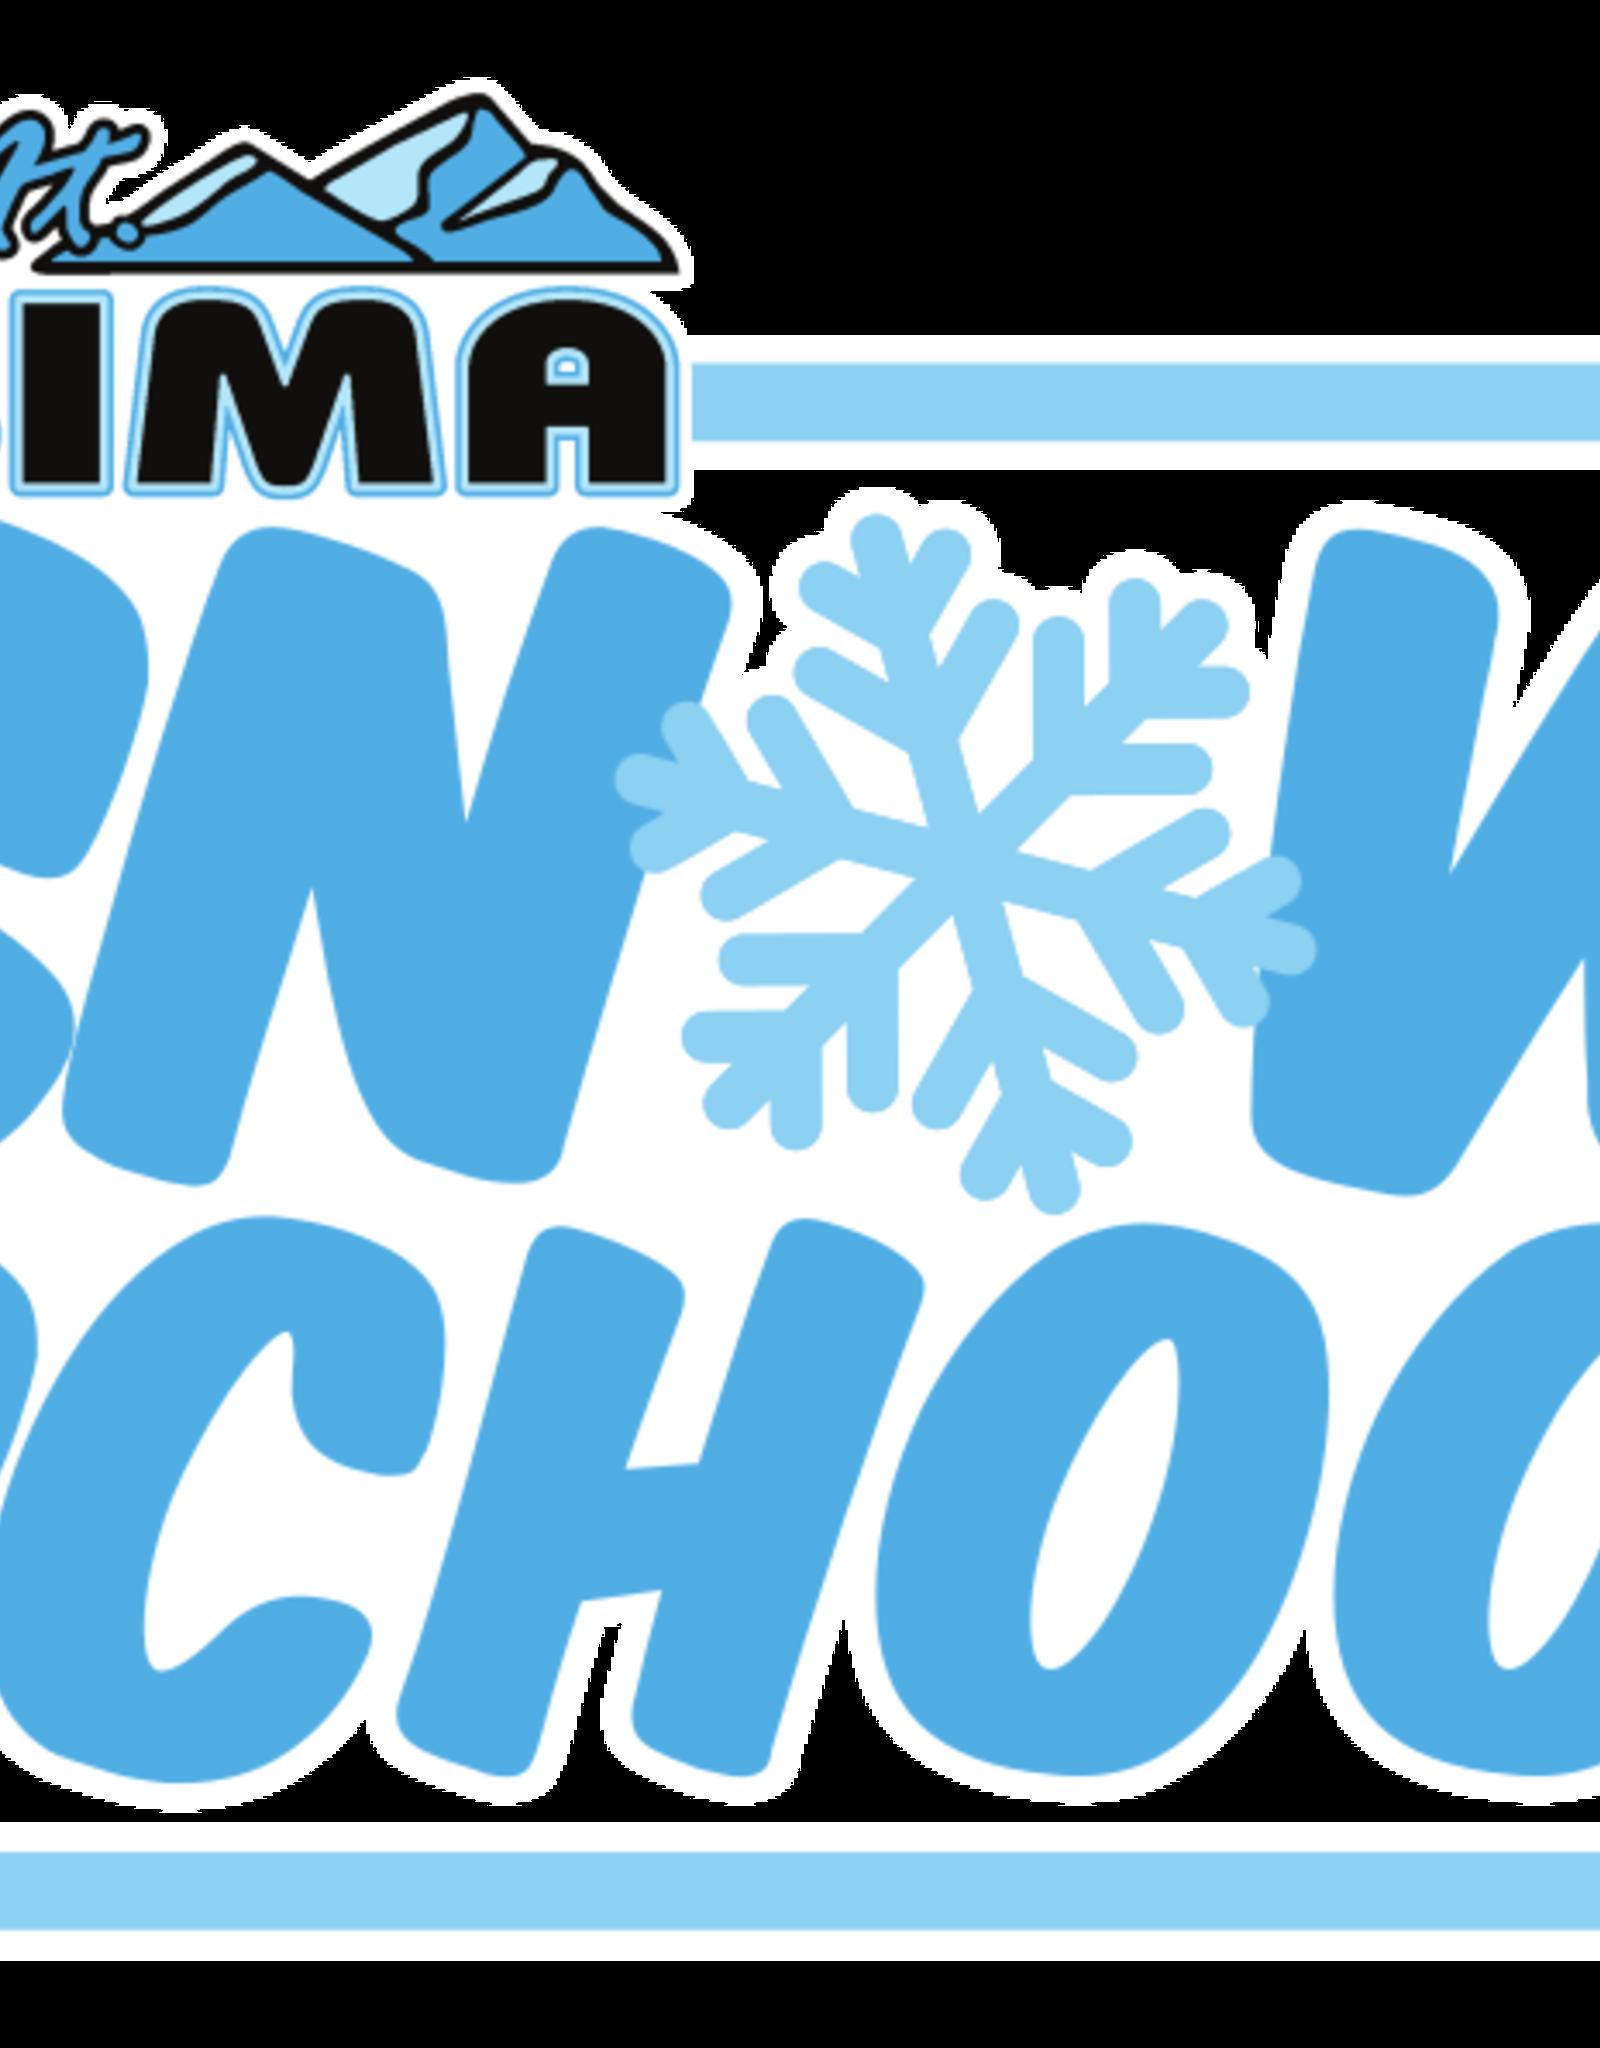 Snow School Christmas Camp 2 - December 28-31